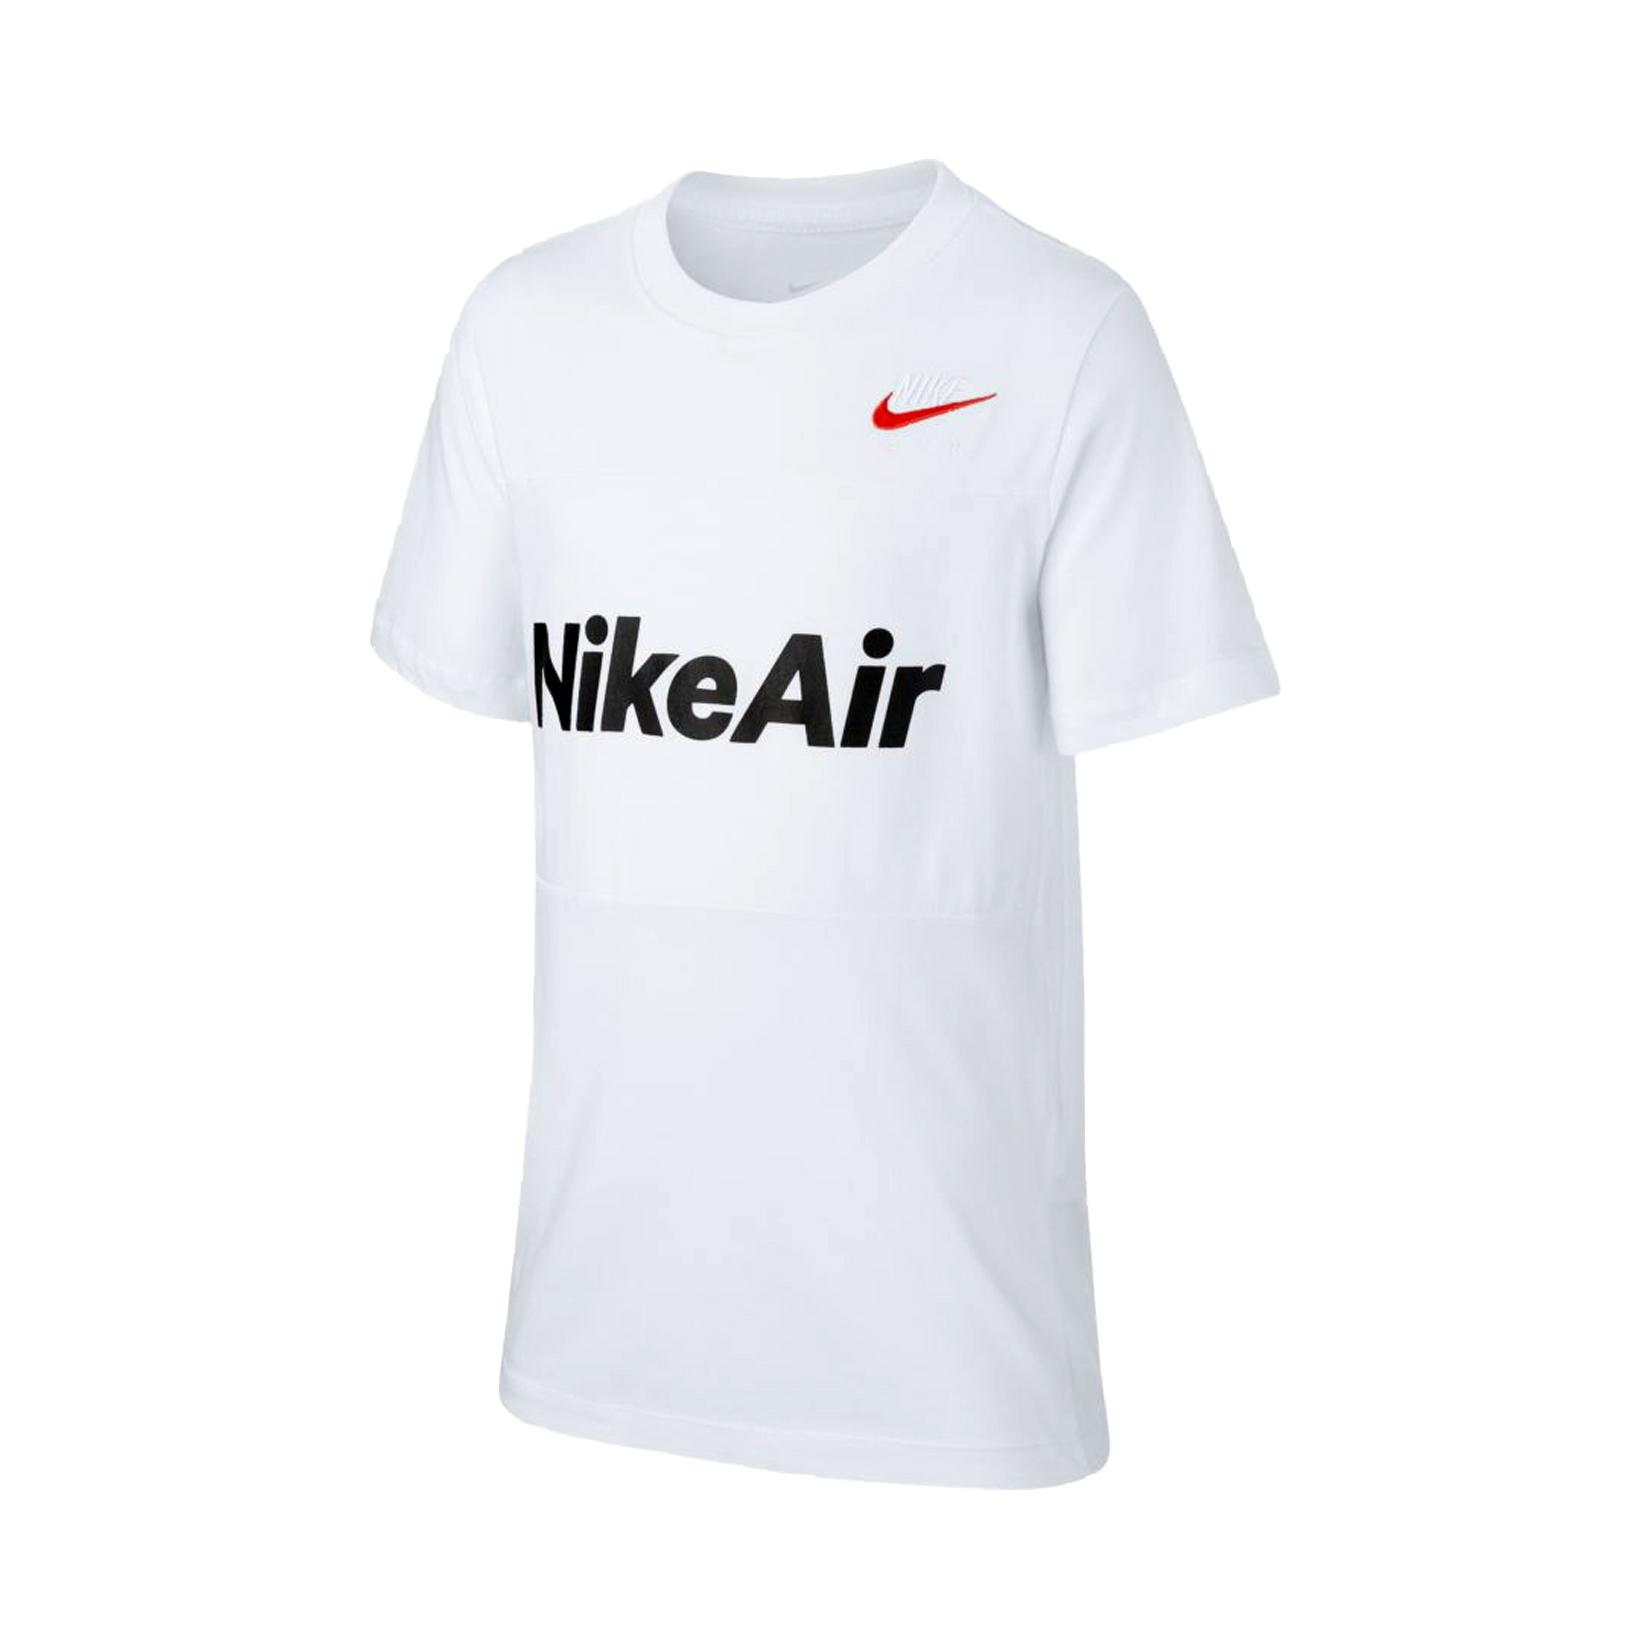 Nike Sportswear Air Tee Big Boys White